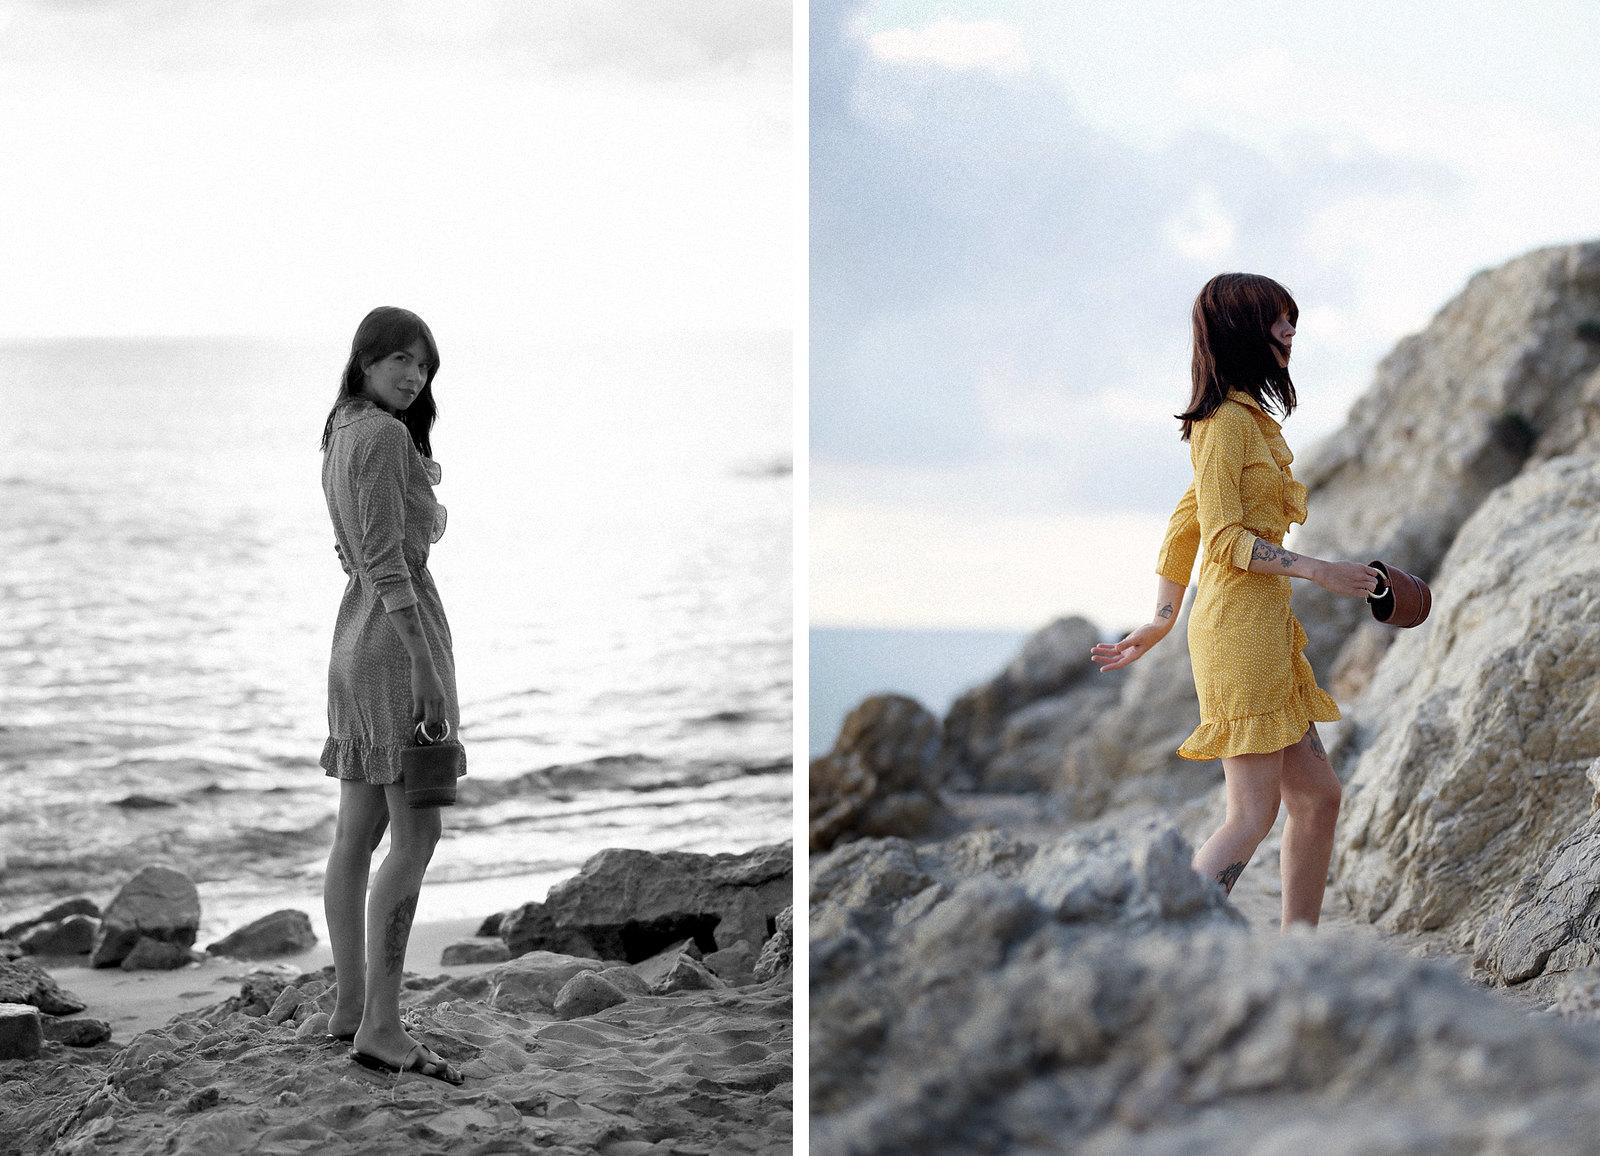 vila yellow mustard polka dot dress mallorca holiday beach sunrise moody style fashionblogger cats & dogs modeblog ricarda schernus fotograf max bechmann düsseldorf travelbloggers roamers 2